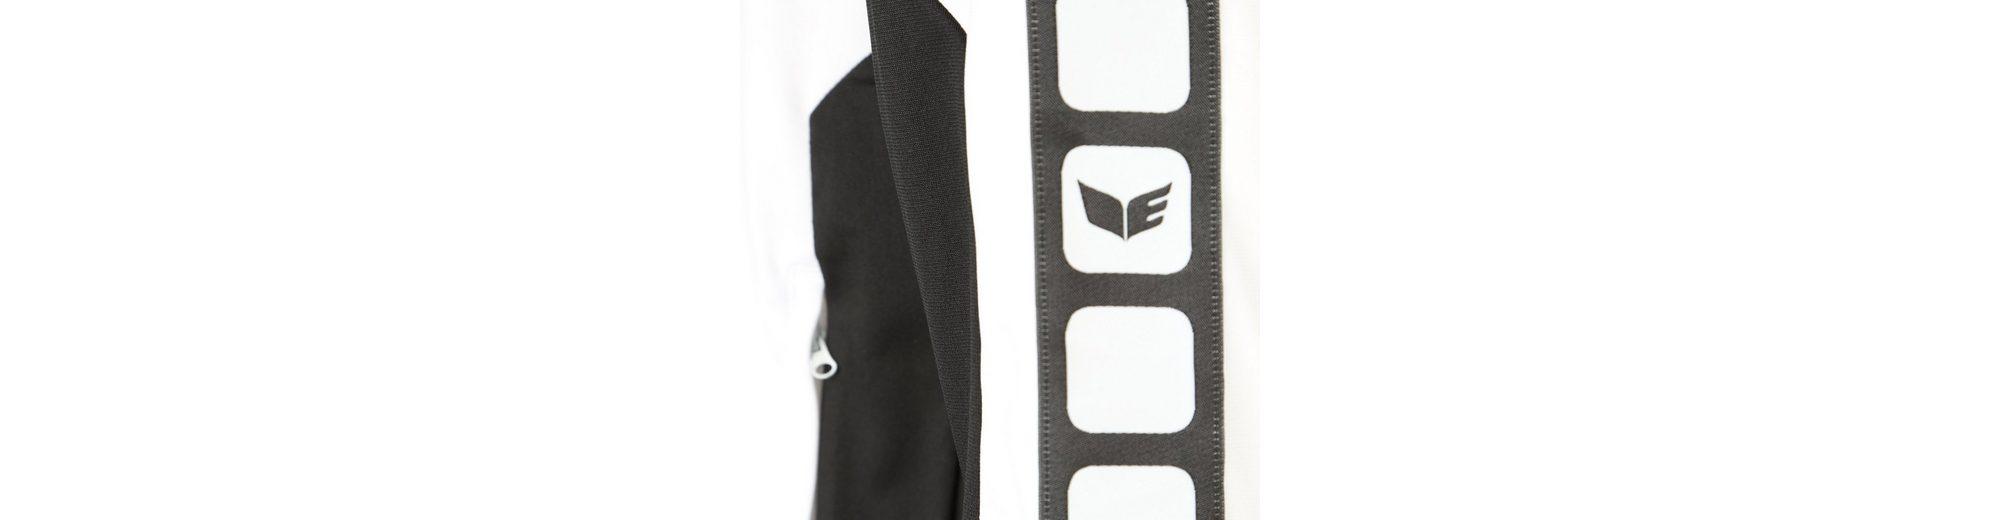 ERIMA 5-CUBES Trainingsjacke mit Kapuze Herren Großhandelspreis rzqNjjpbww